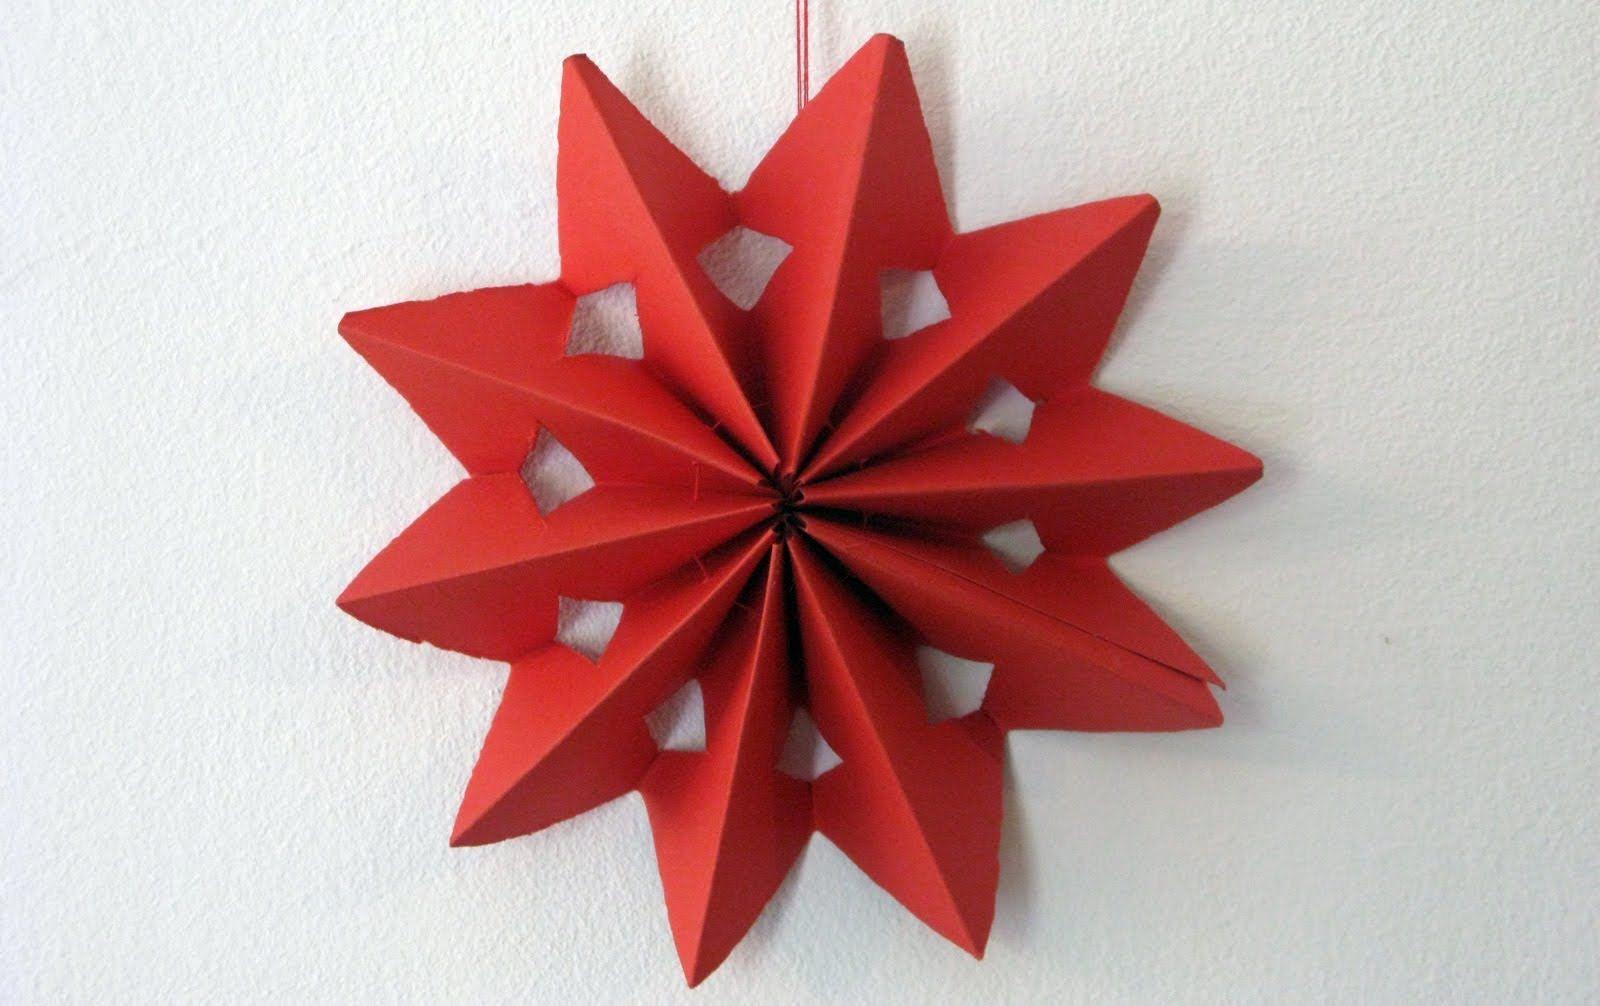 Manualidades Para Decorar Estrella Star Paper Crafts Paper Flowers Crafts